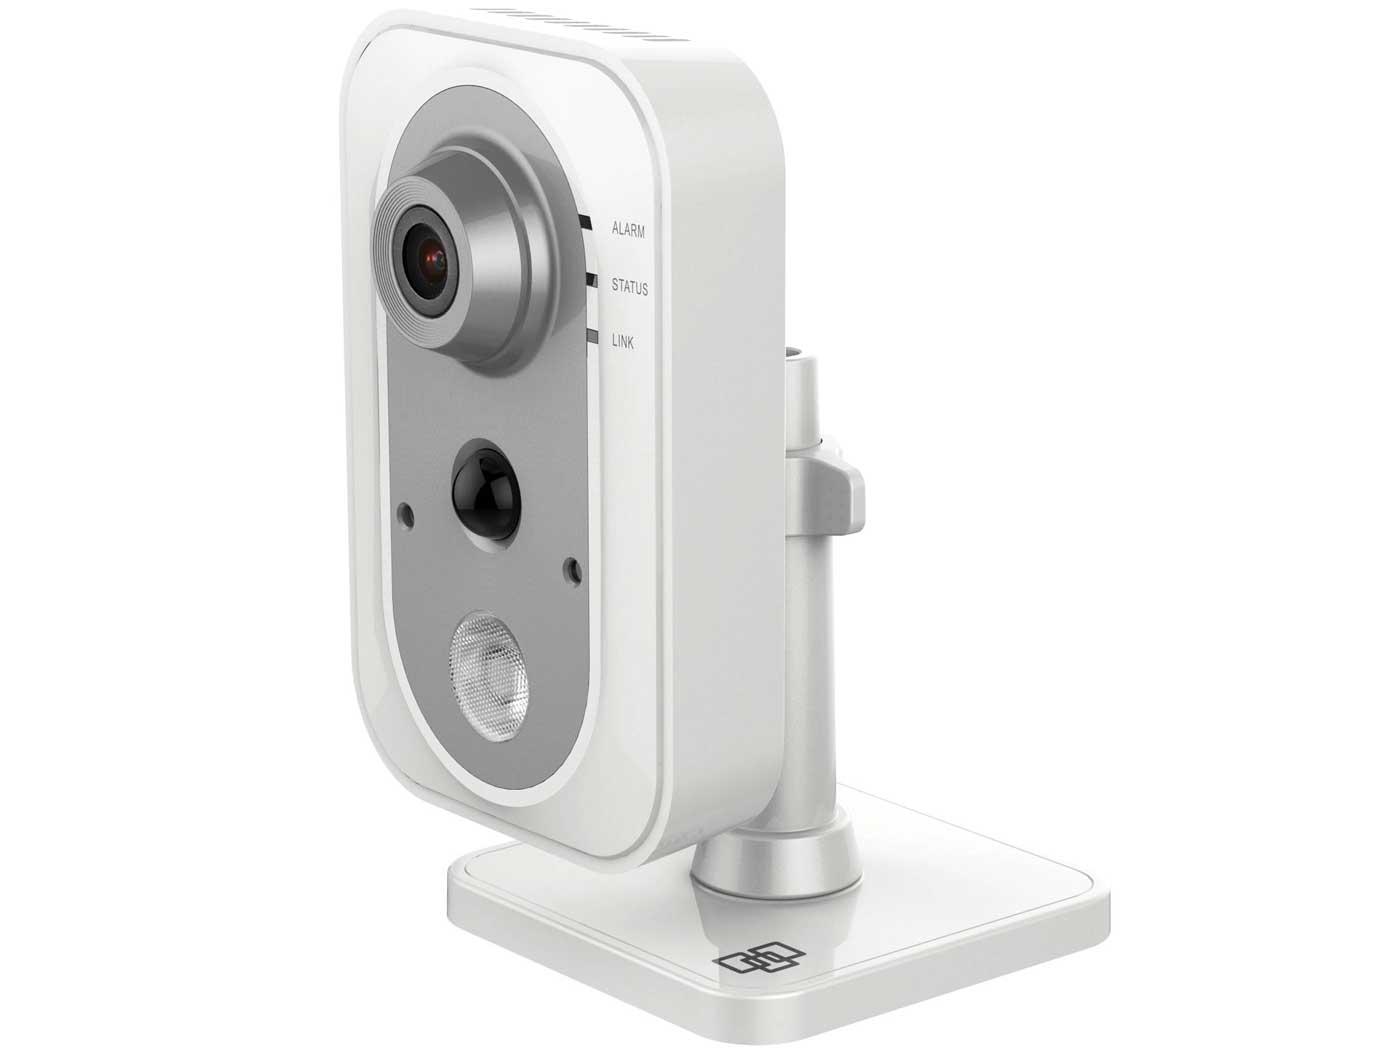 RS-3250 INTERLOGIX ULTRASYNC 1080p IP WI-FI IR BULLET